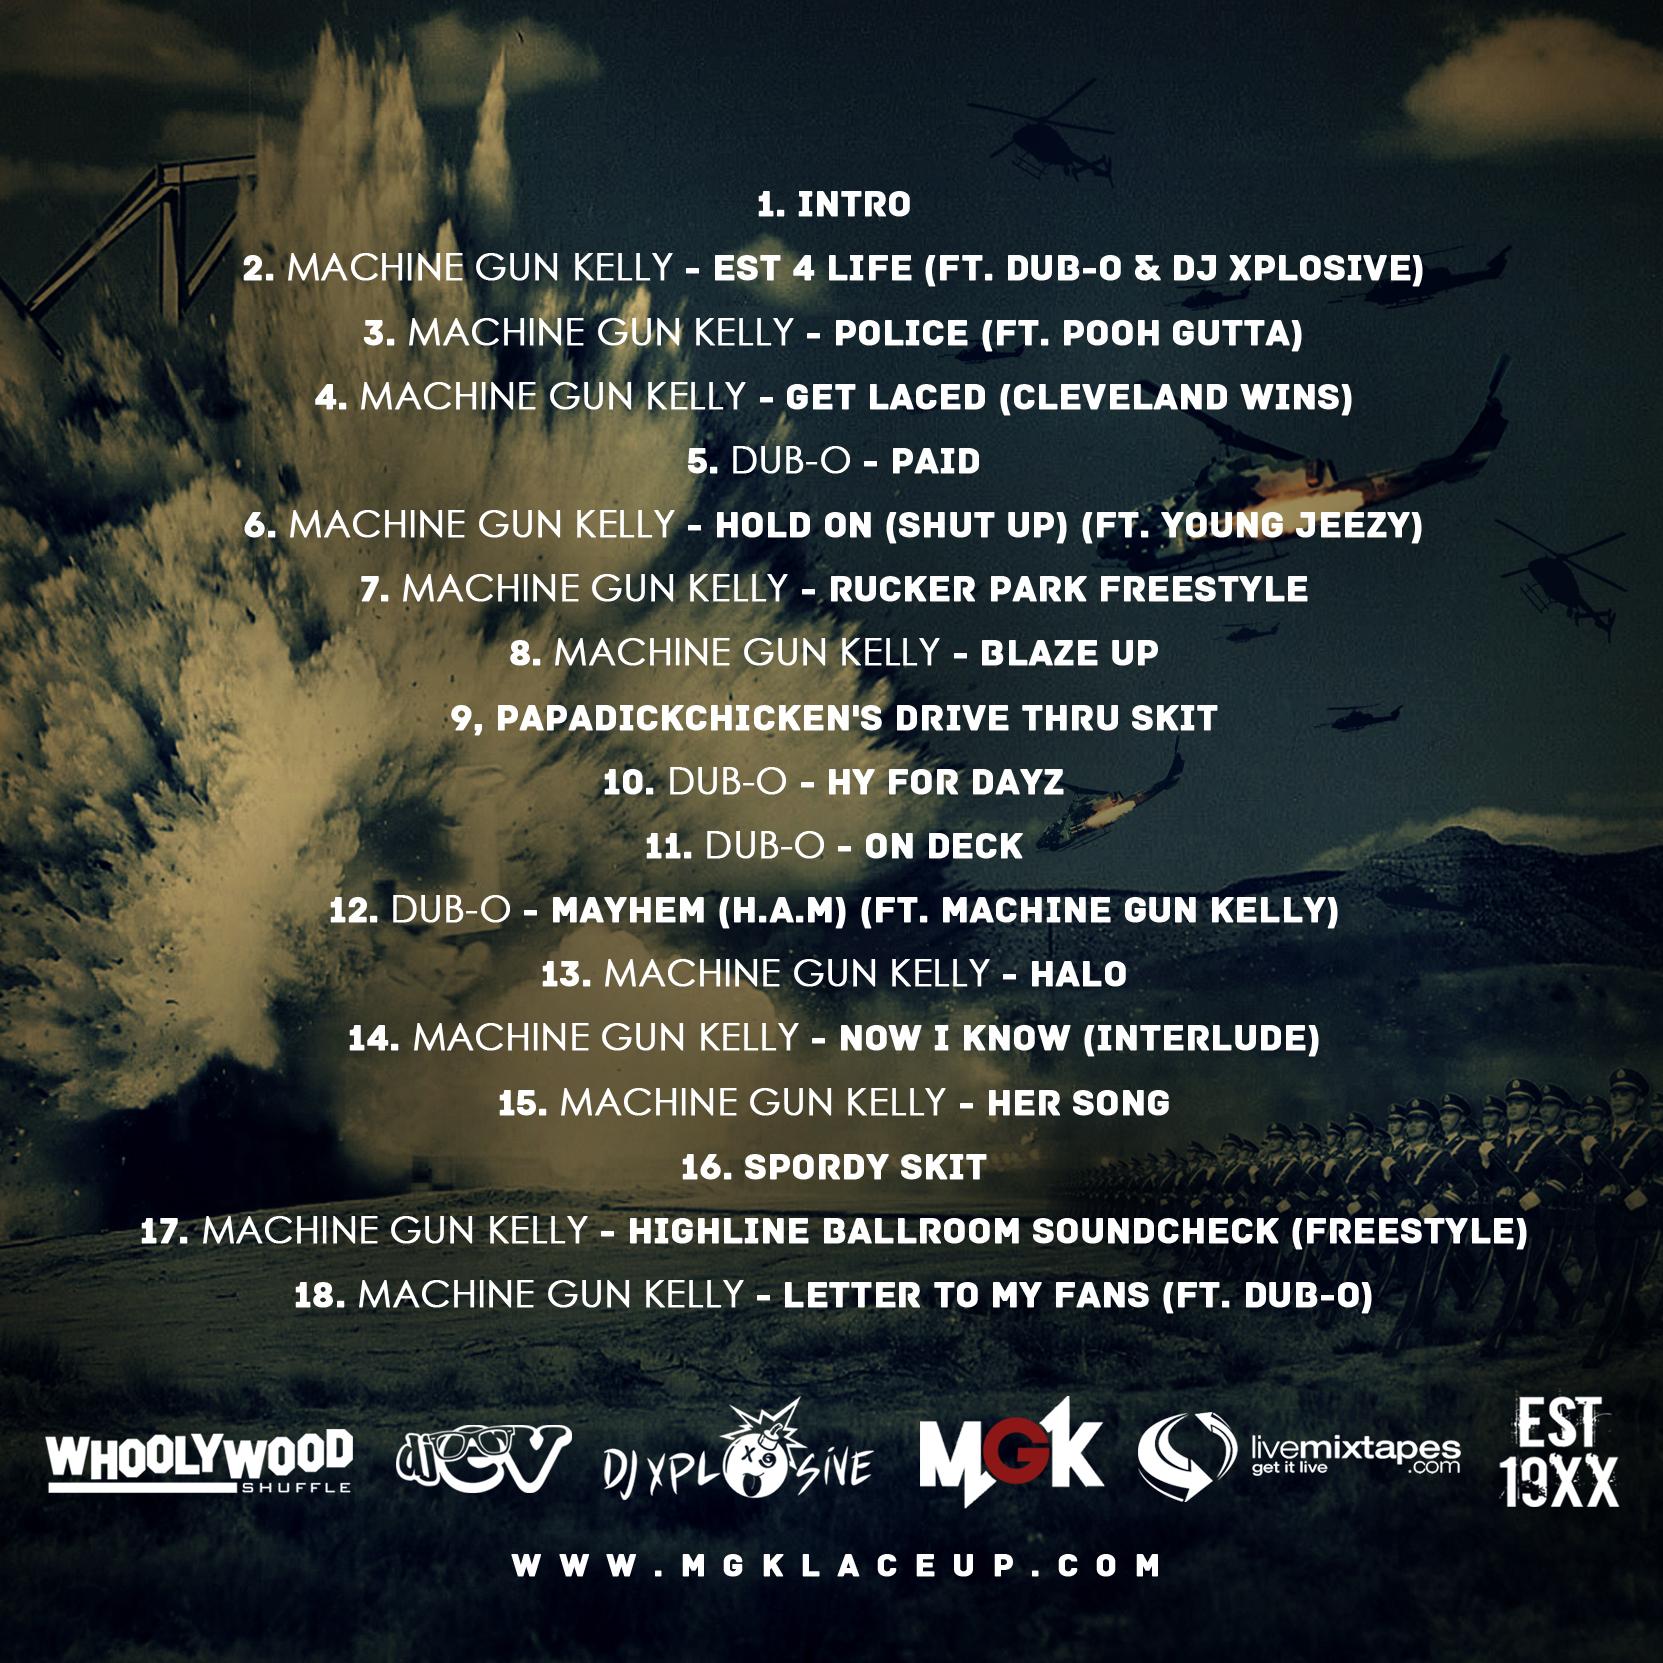 Machine Gun Kelly - EST 4 Life - DJ Whoo Kid, E-V, DJ Xplosive